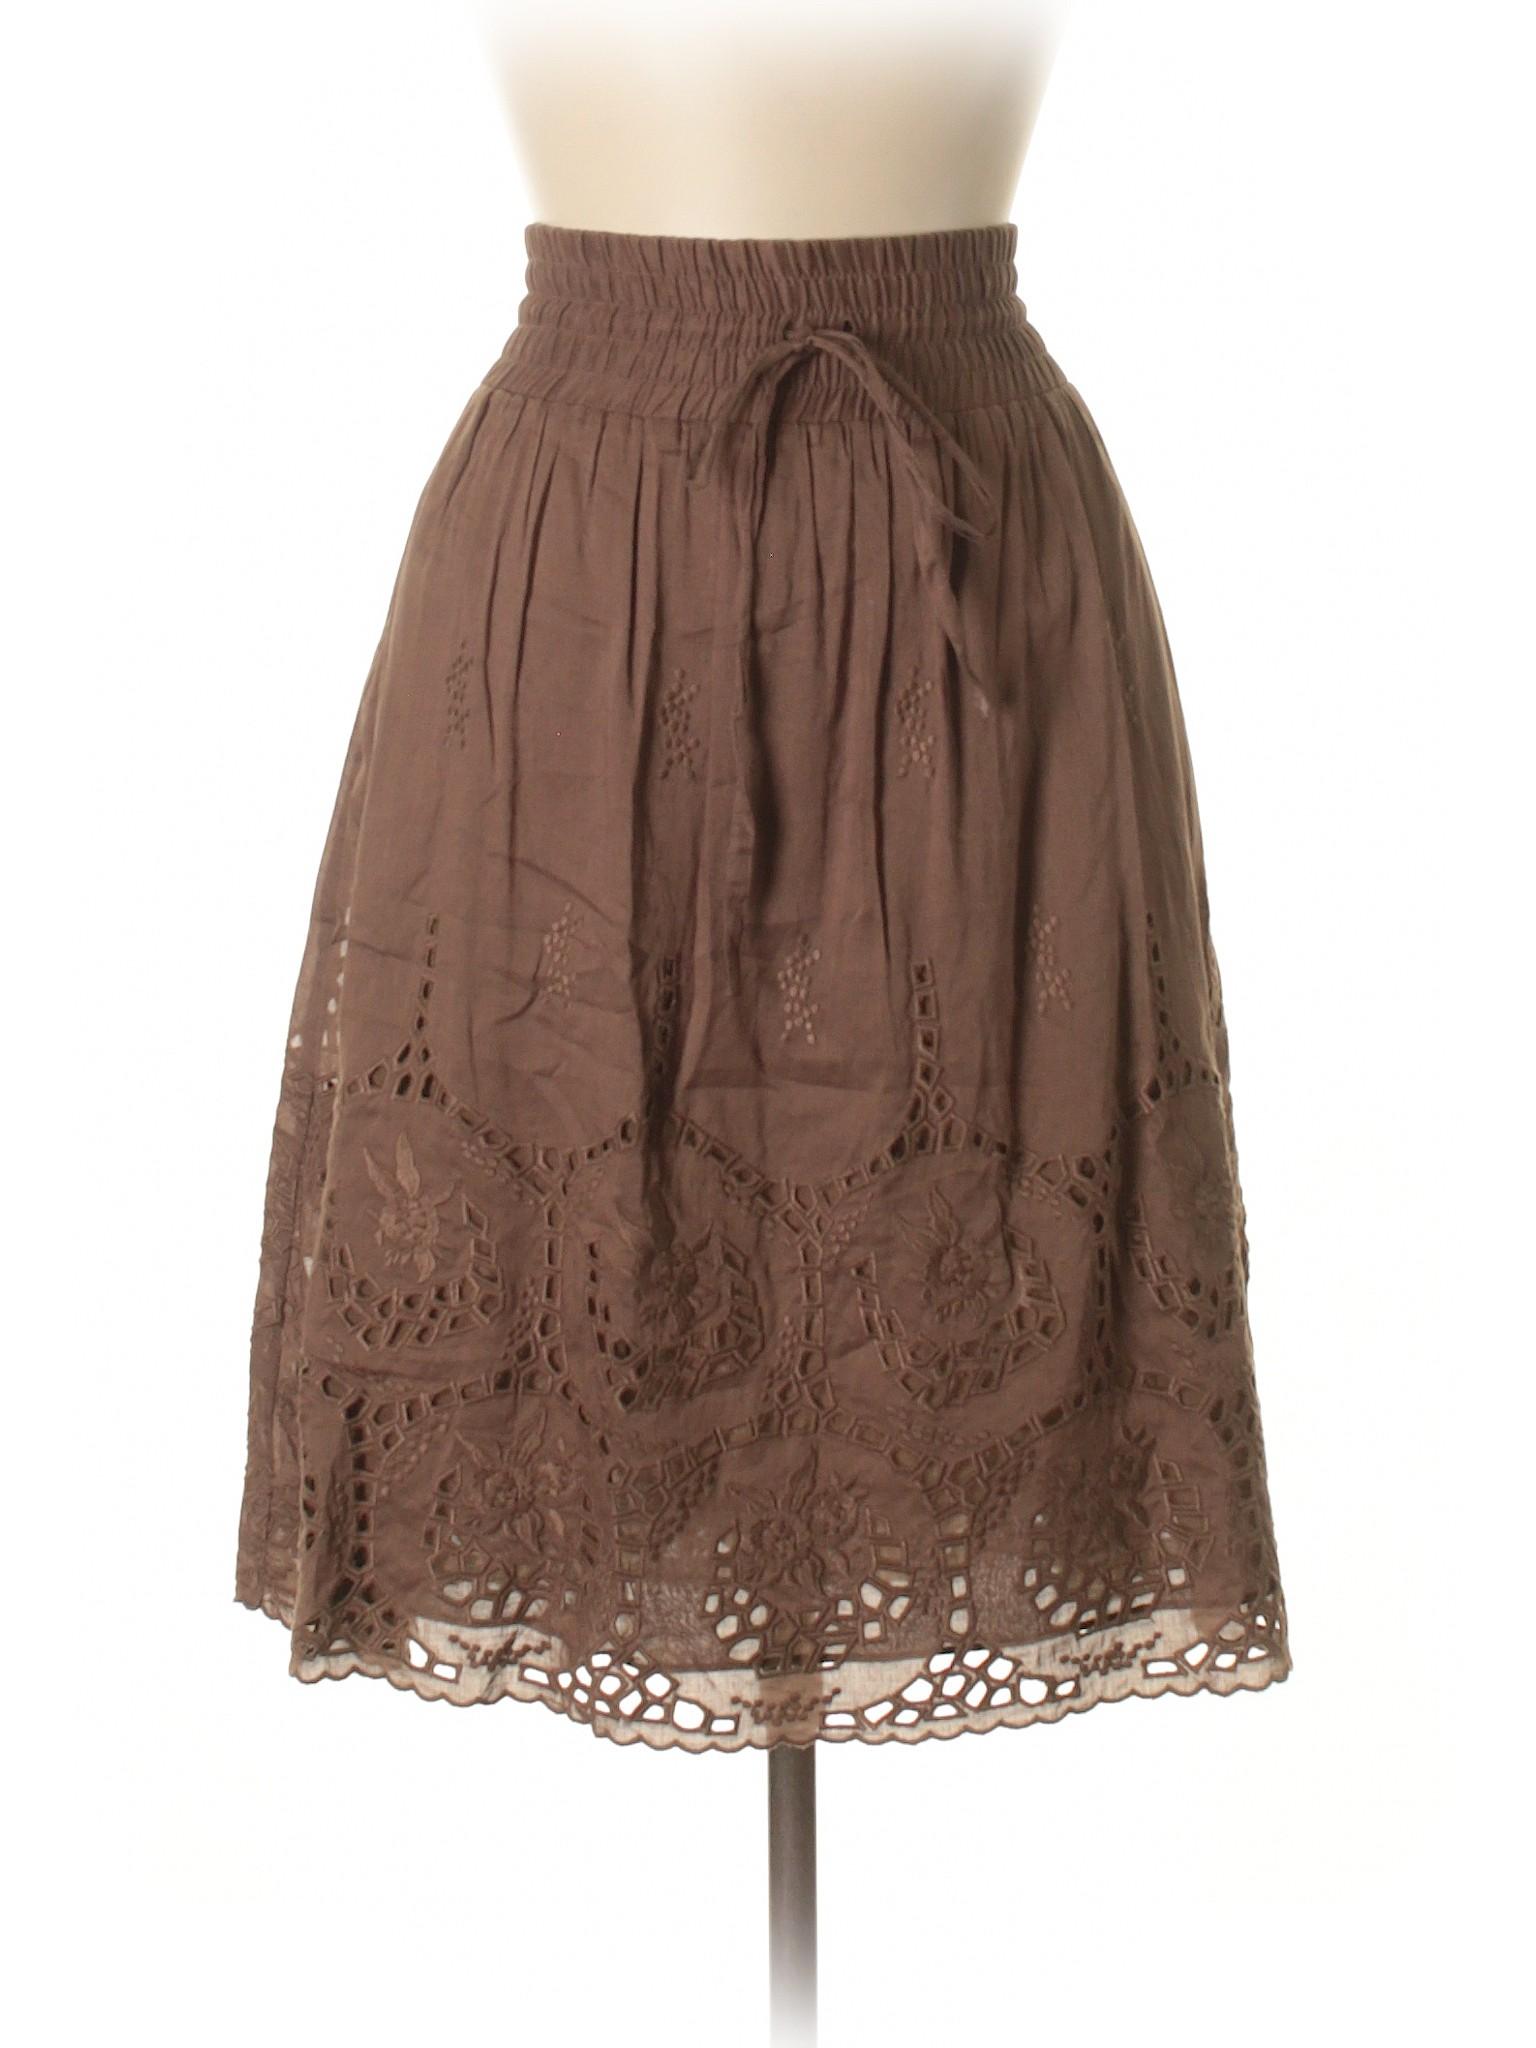 Boutique Casual Skirt Casual Boutique Boutique Casual Skirt BaS1w